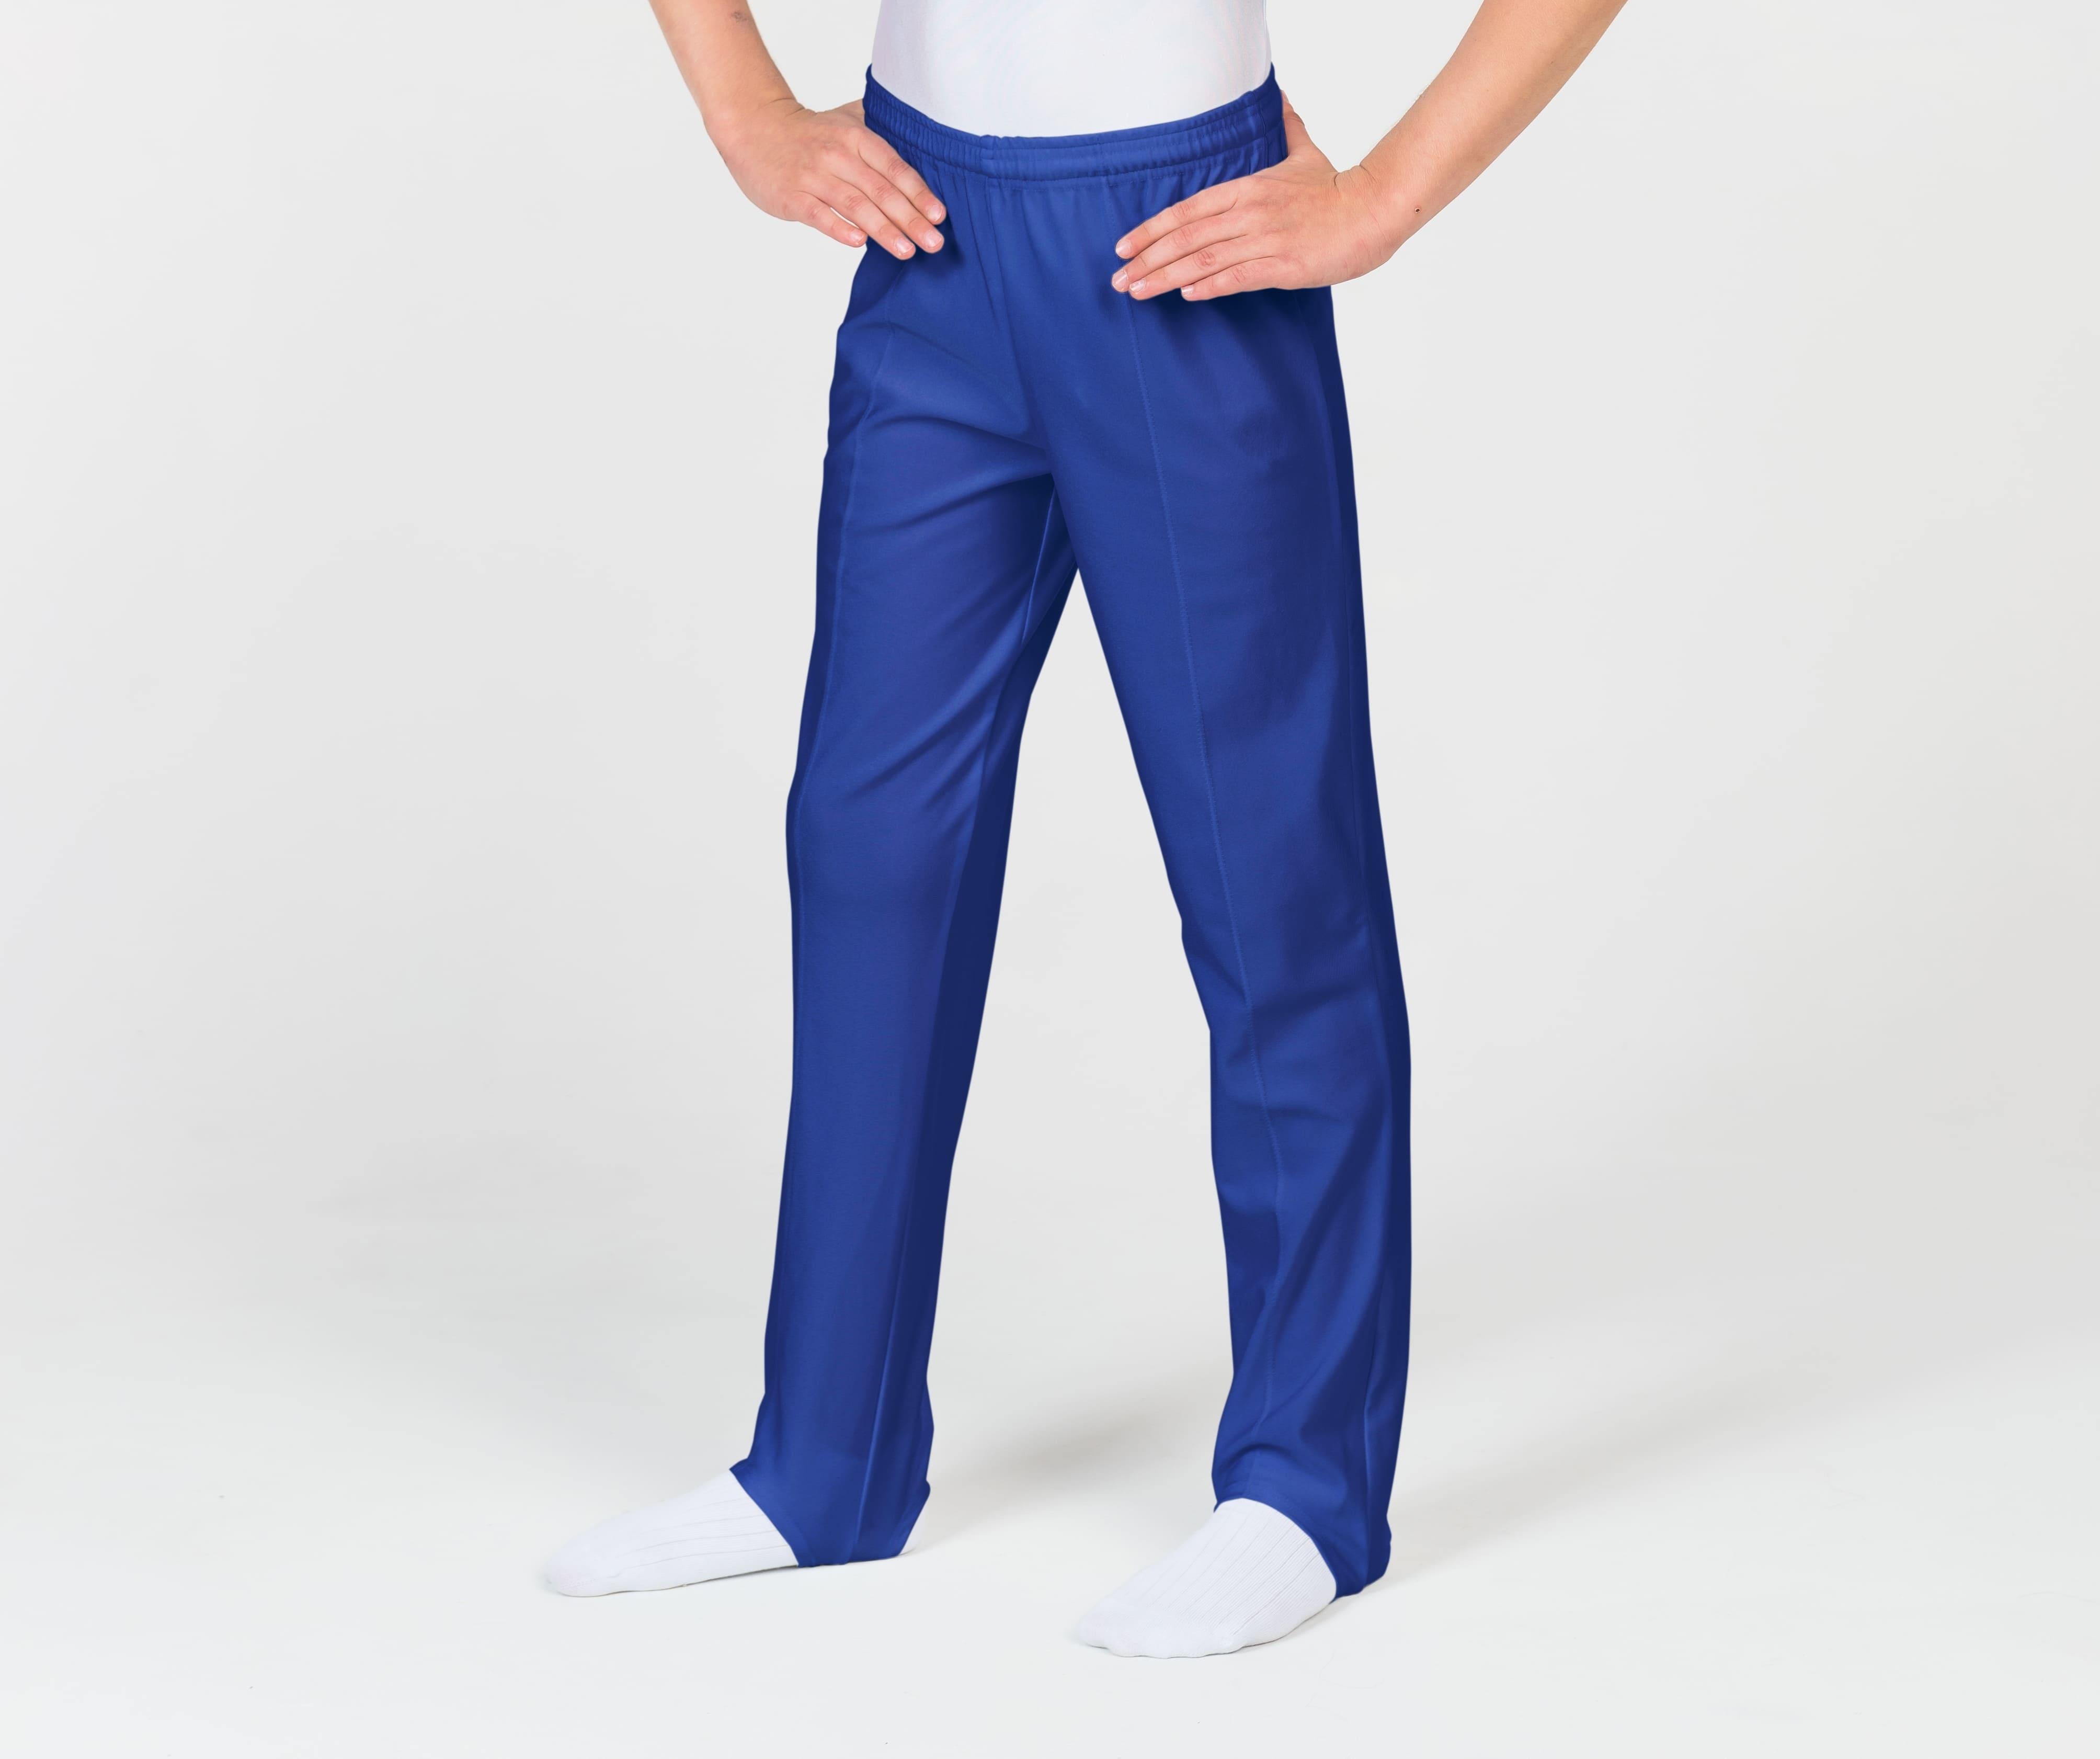 Men's Leotards, Gymnastic pants (male), pic 1